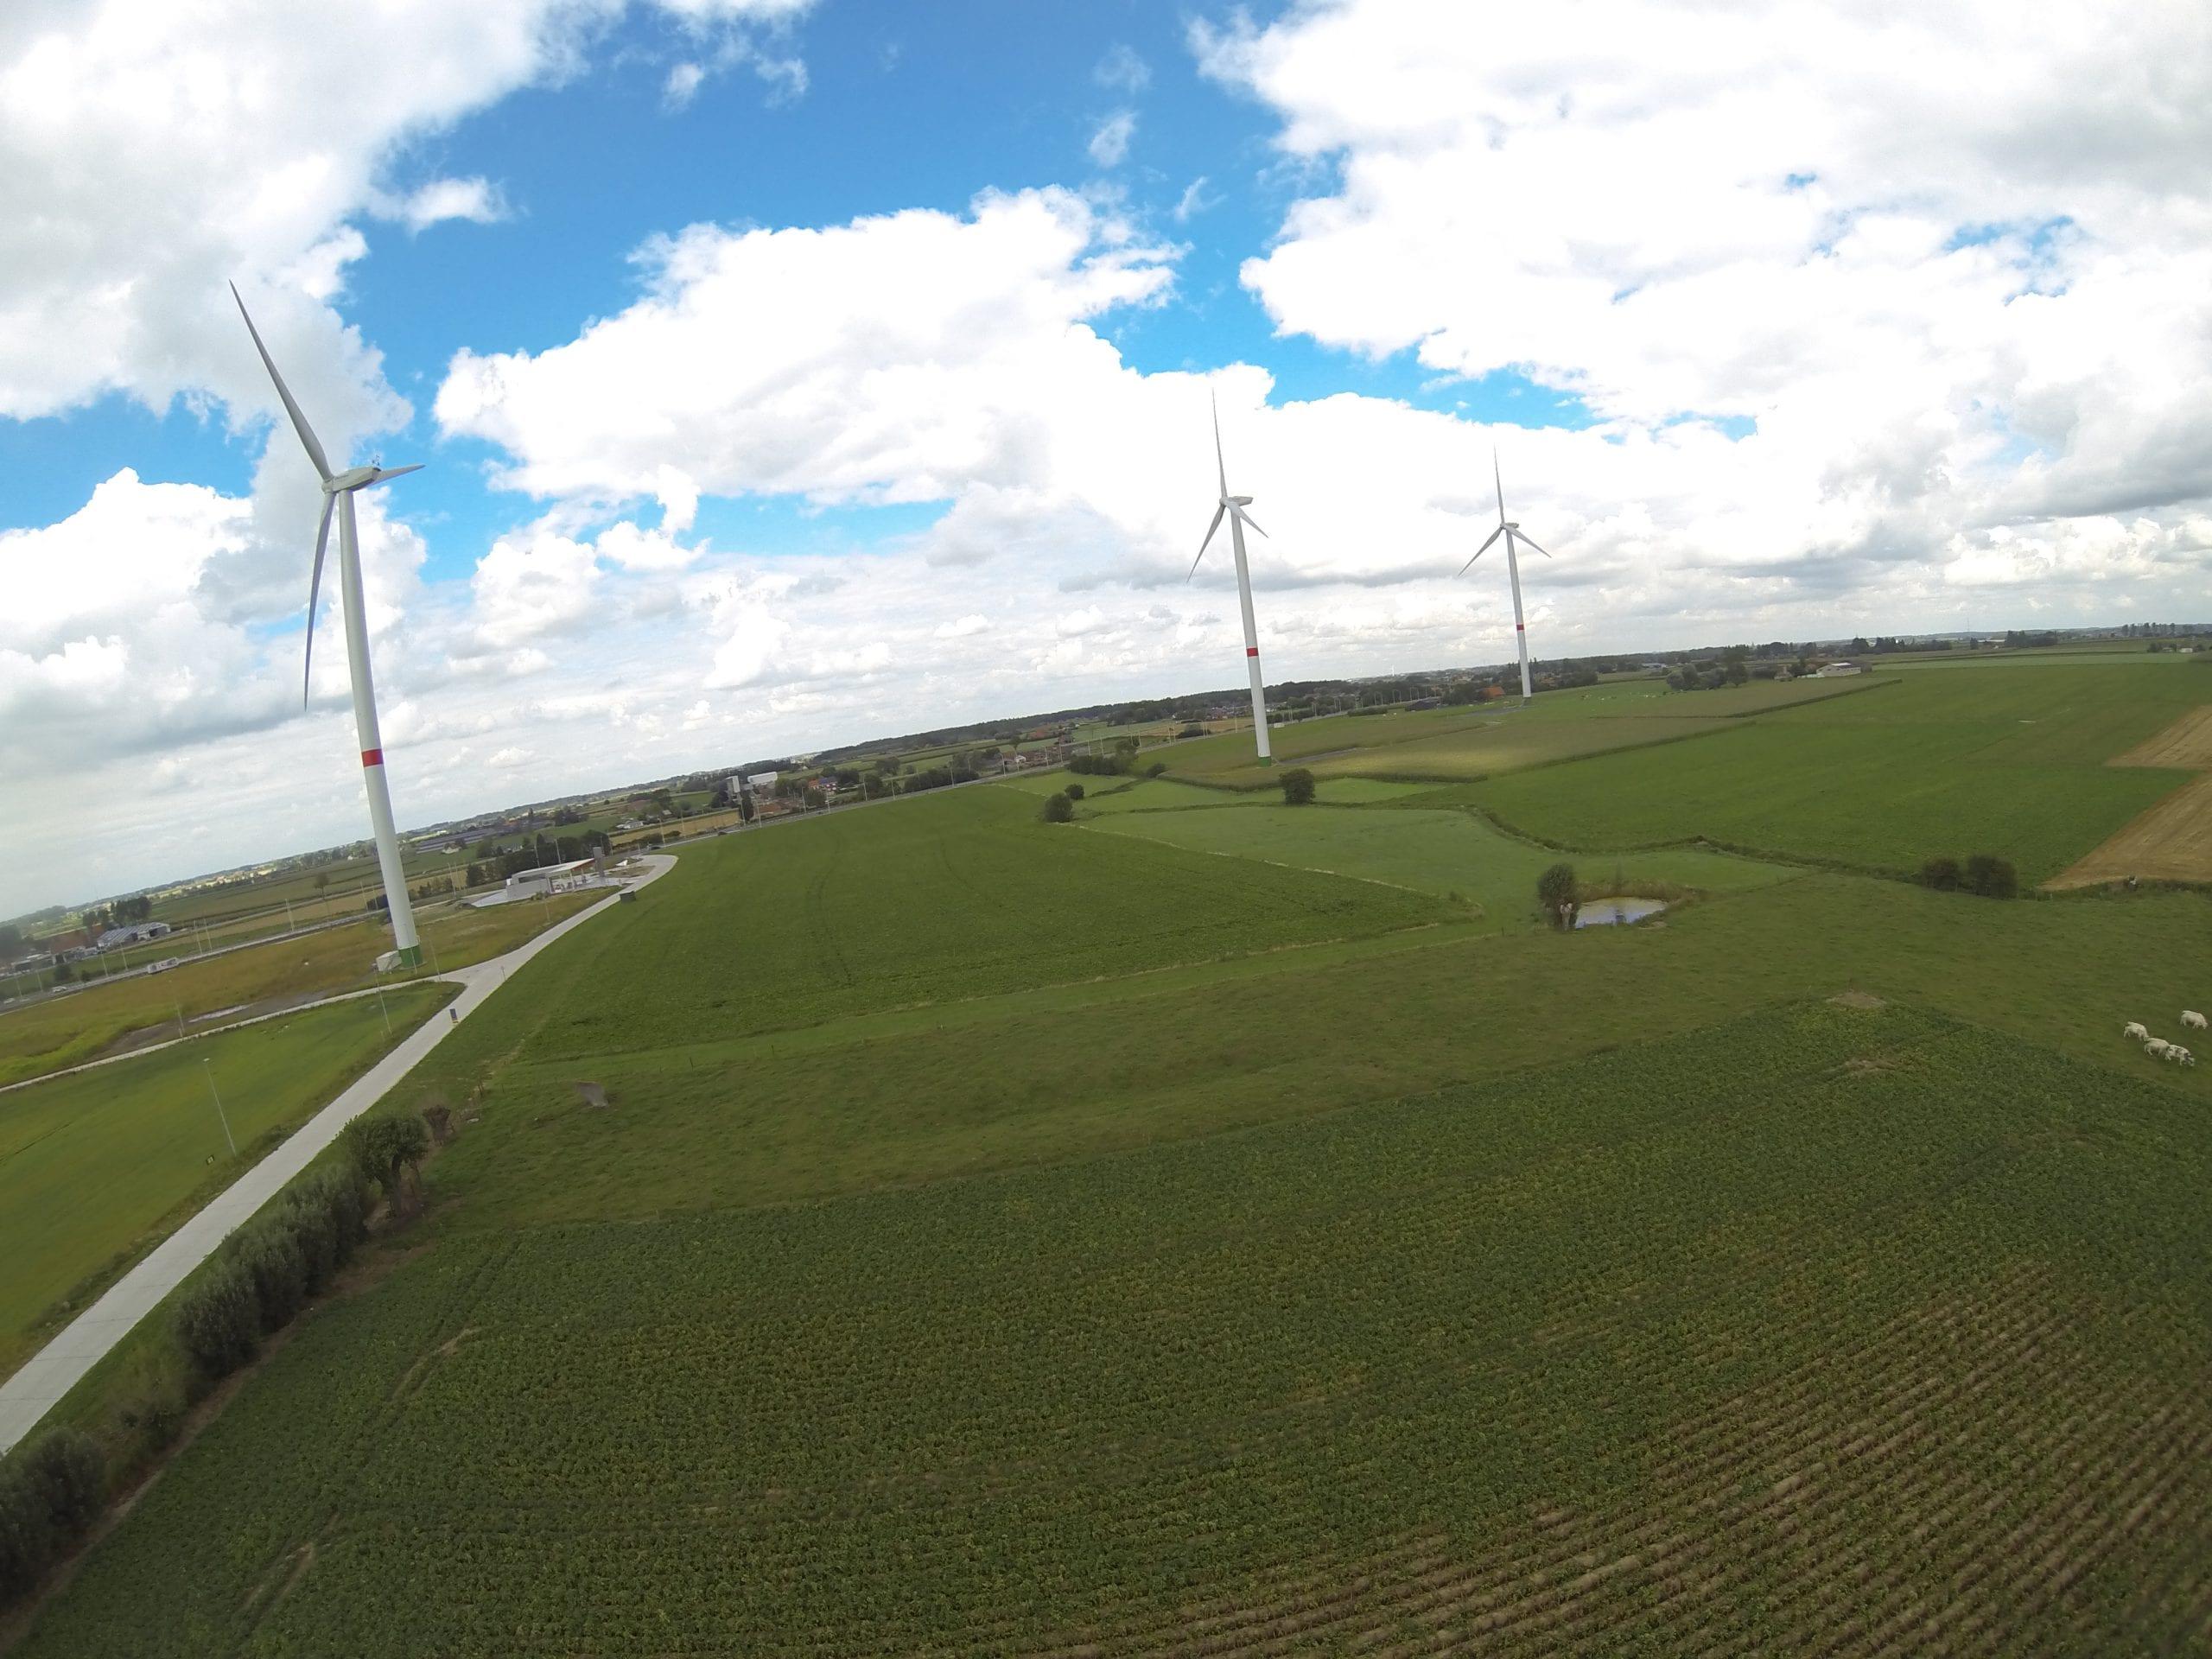 Electric wind turbines of Poperinge